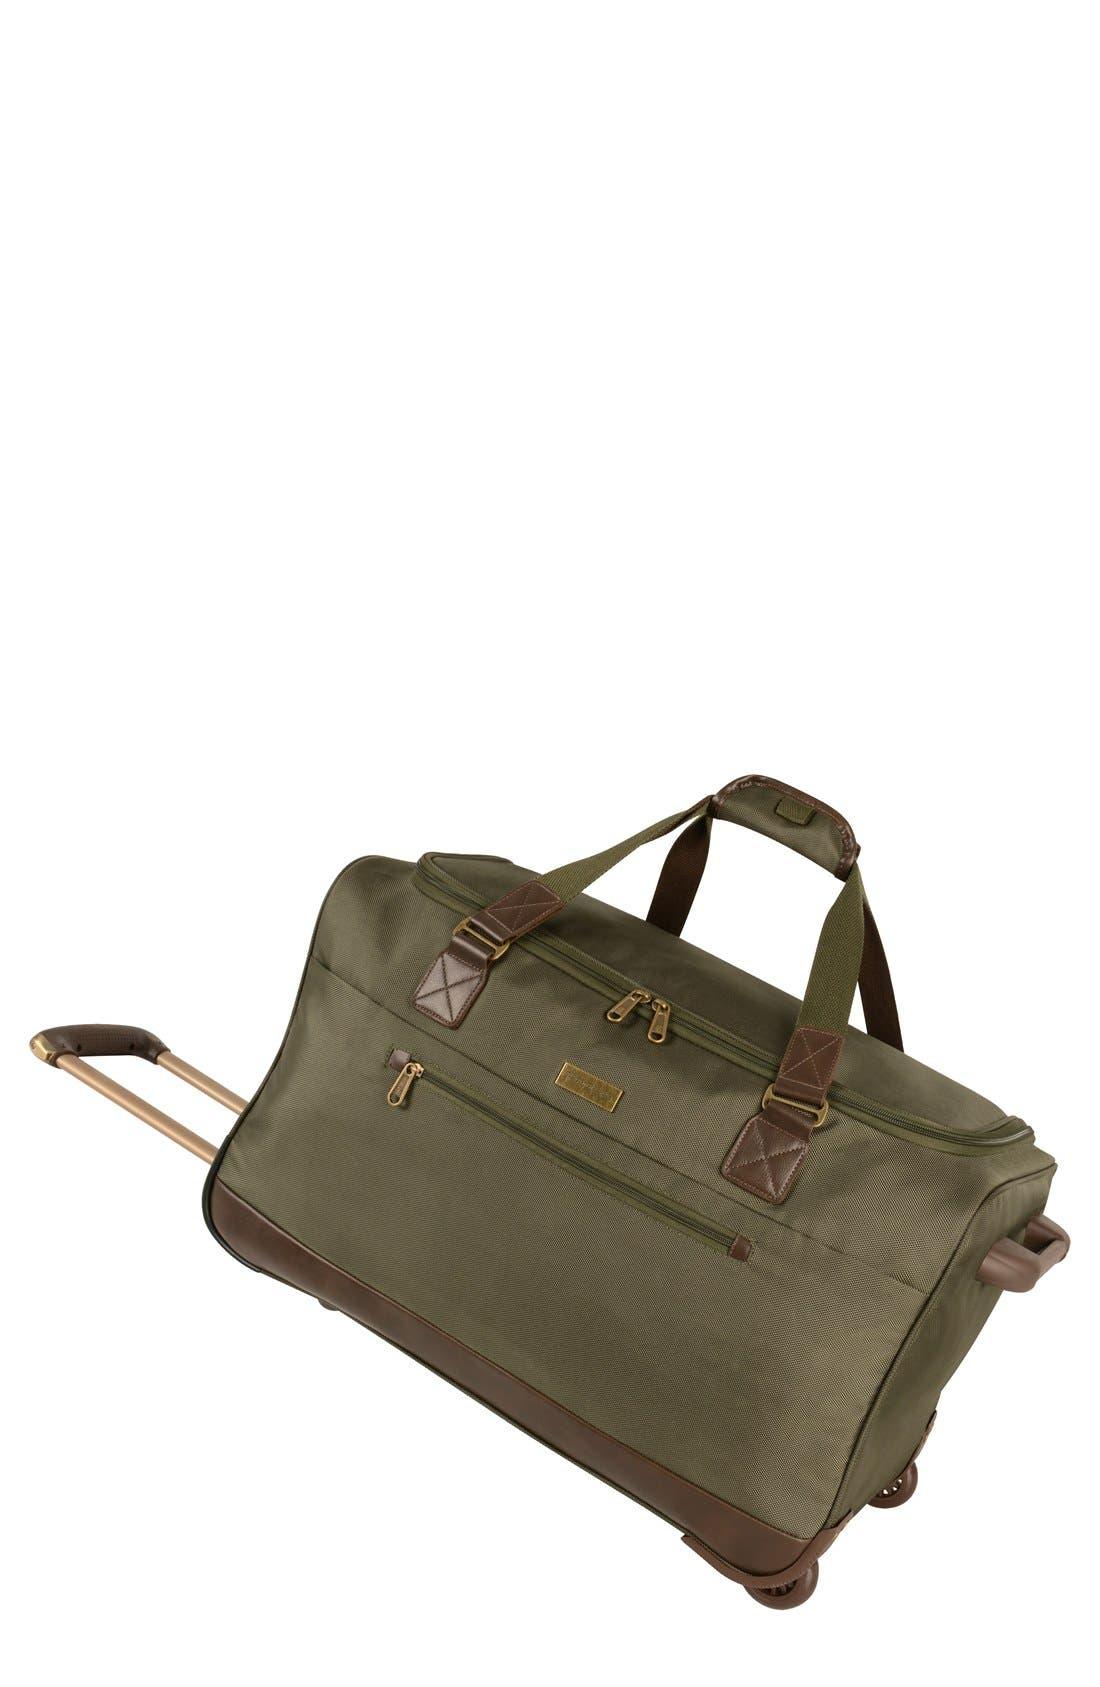 Tommy Bahama 'Surge' Wheeled Duffel Bag (27 Inch)